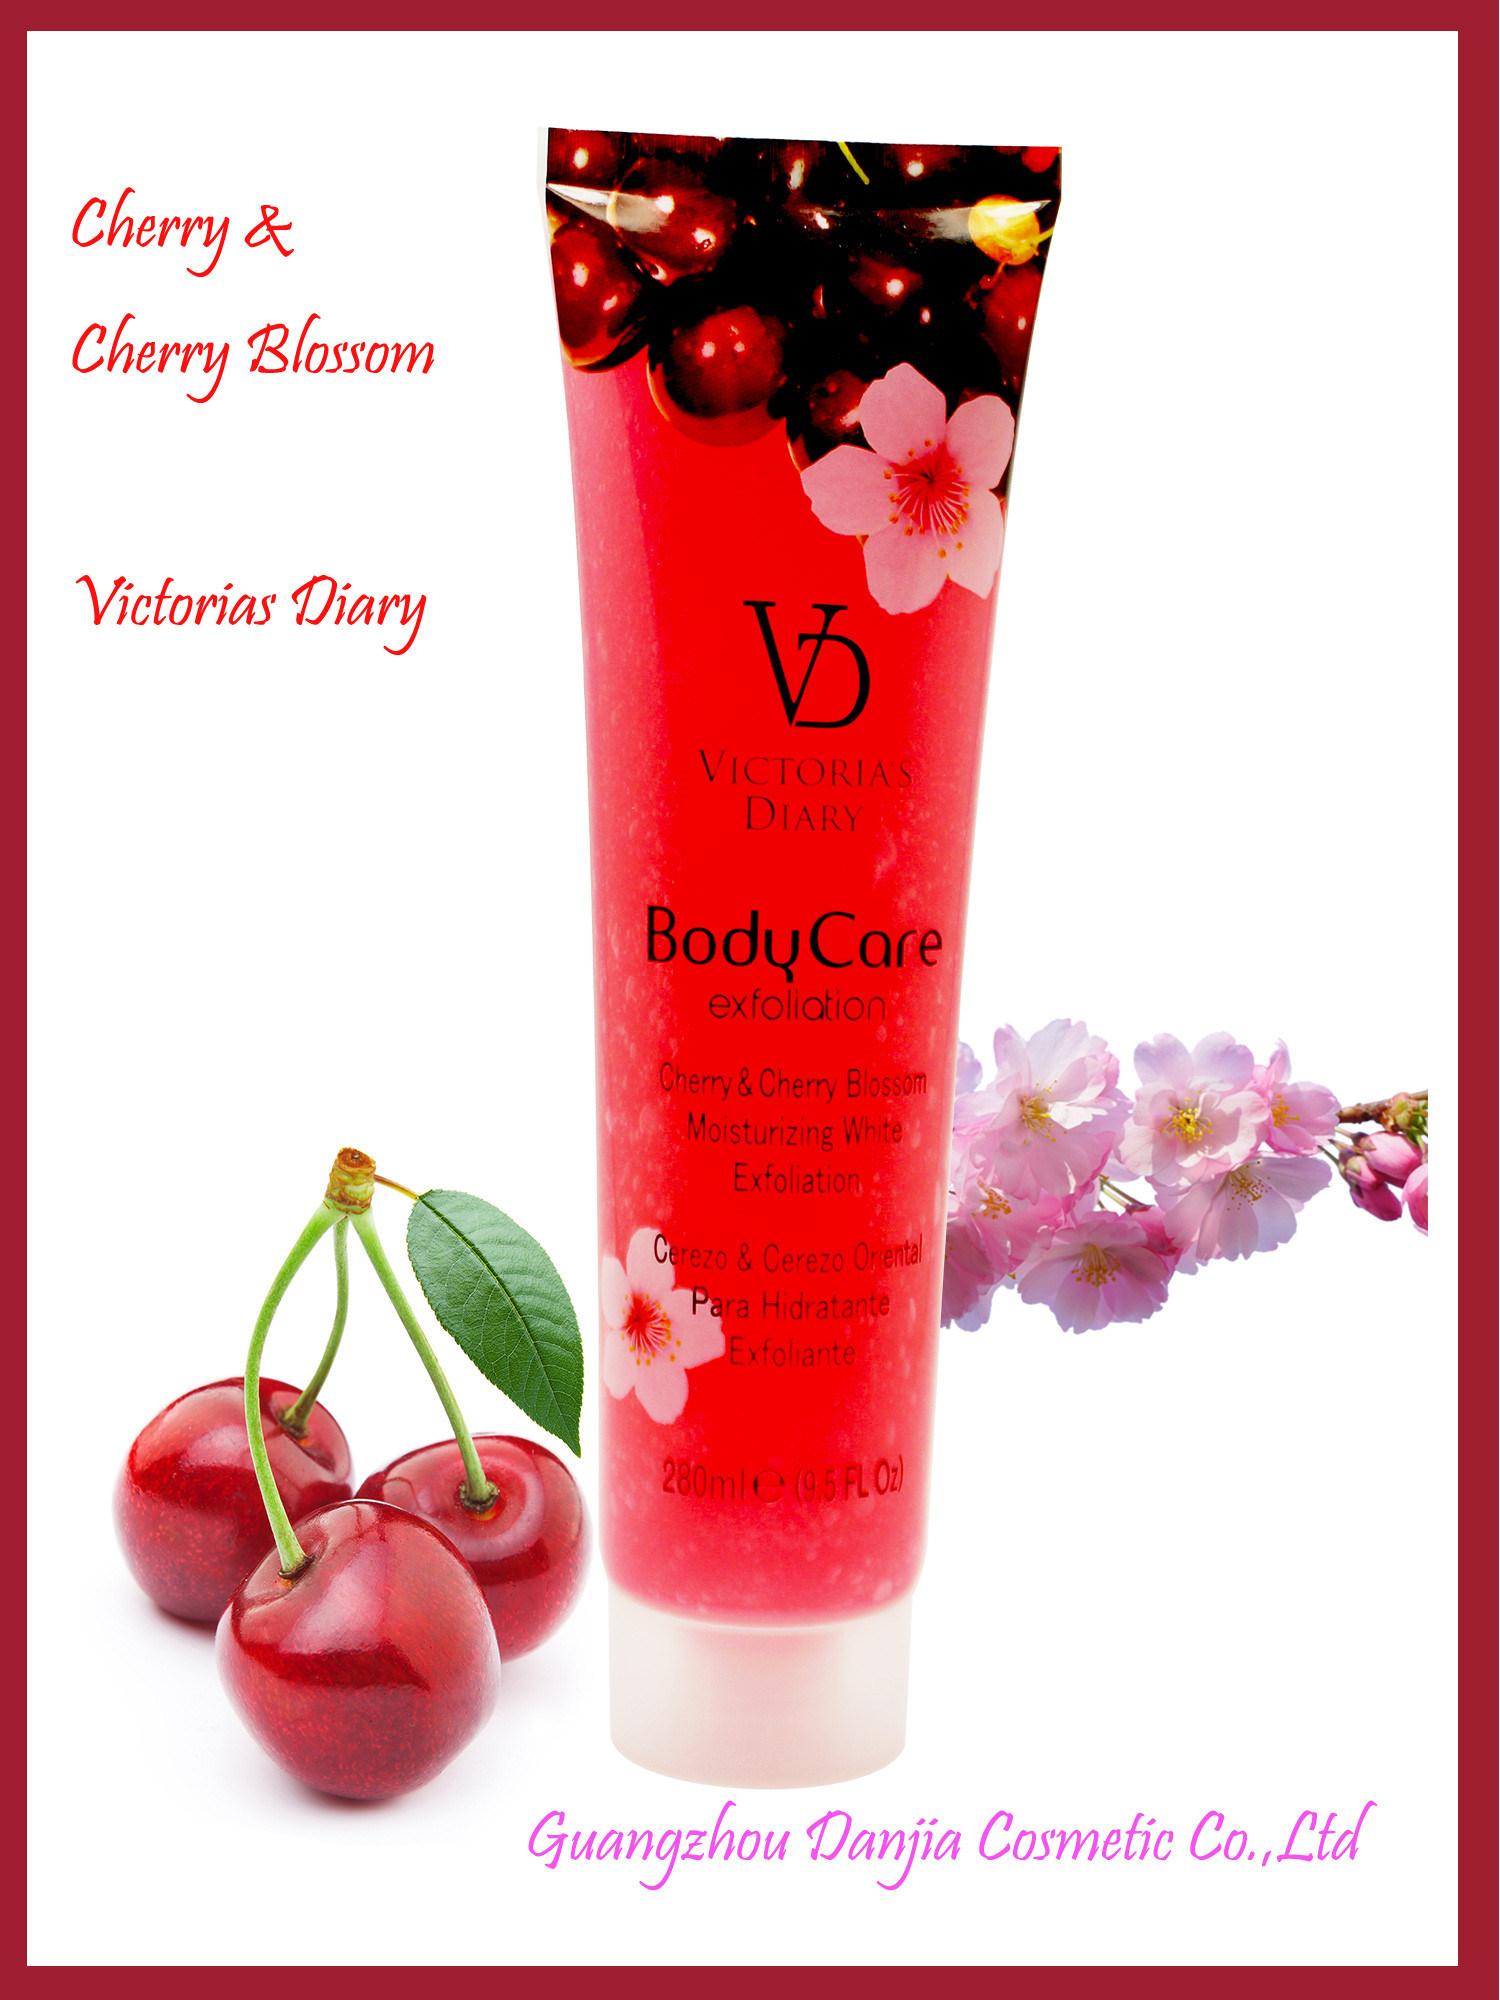 Cherry & Cherry Blossom Moisturizing Exfoliator